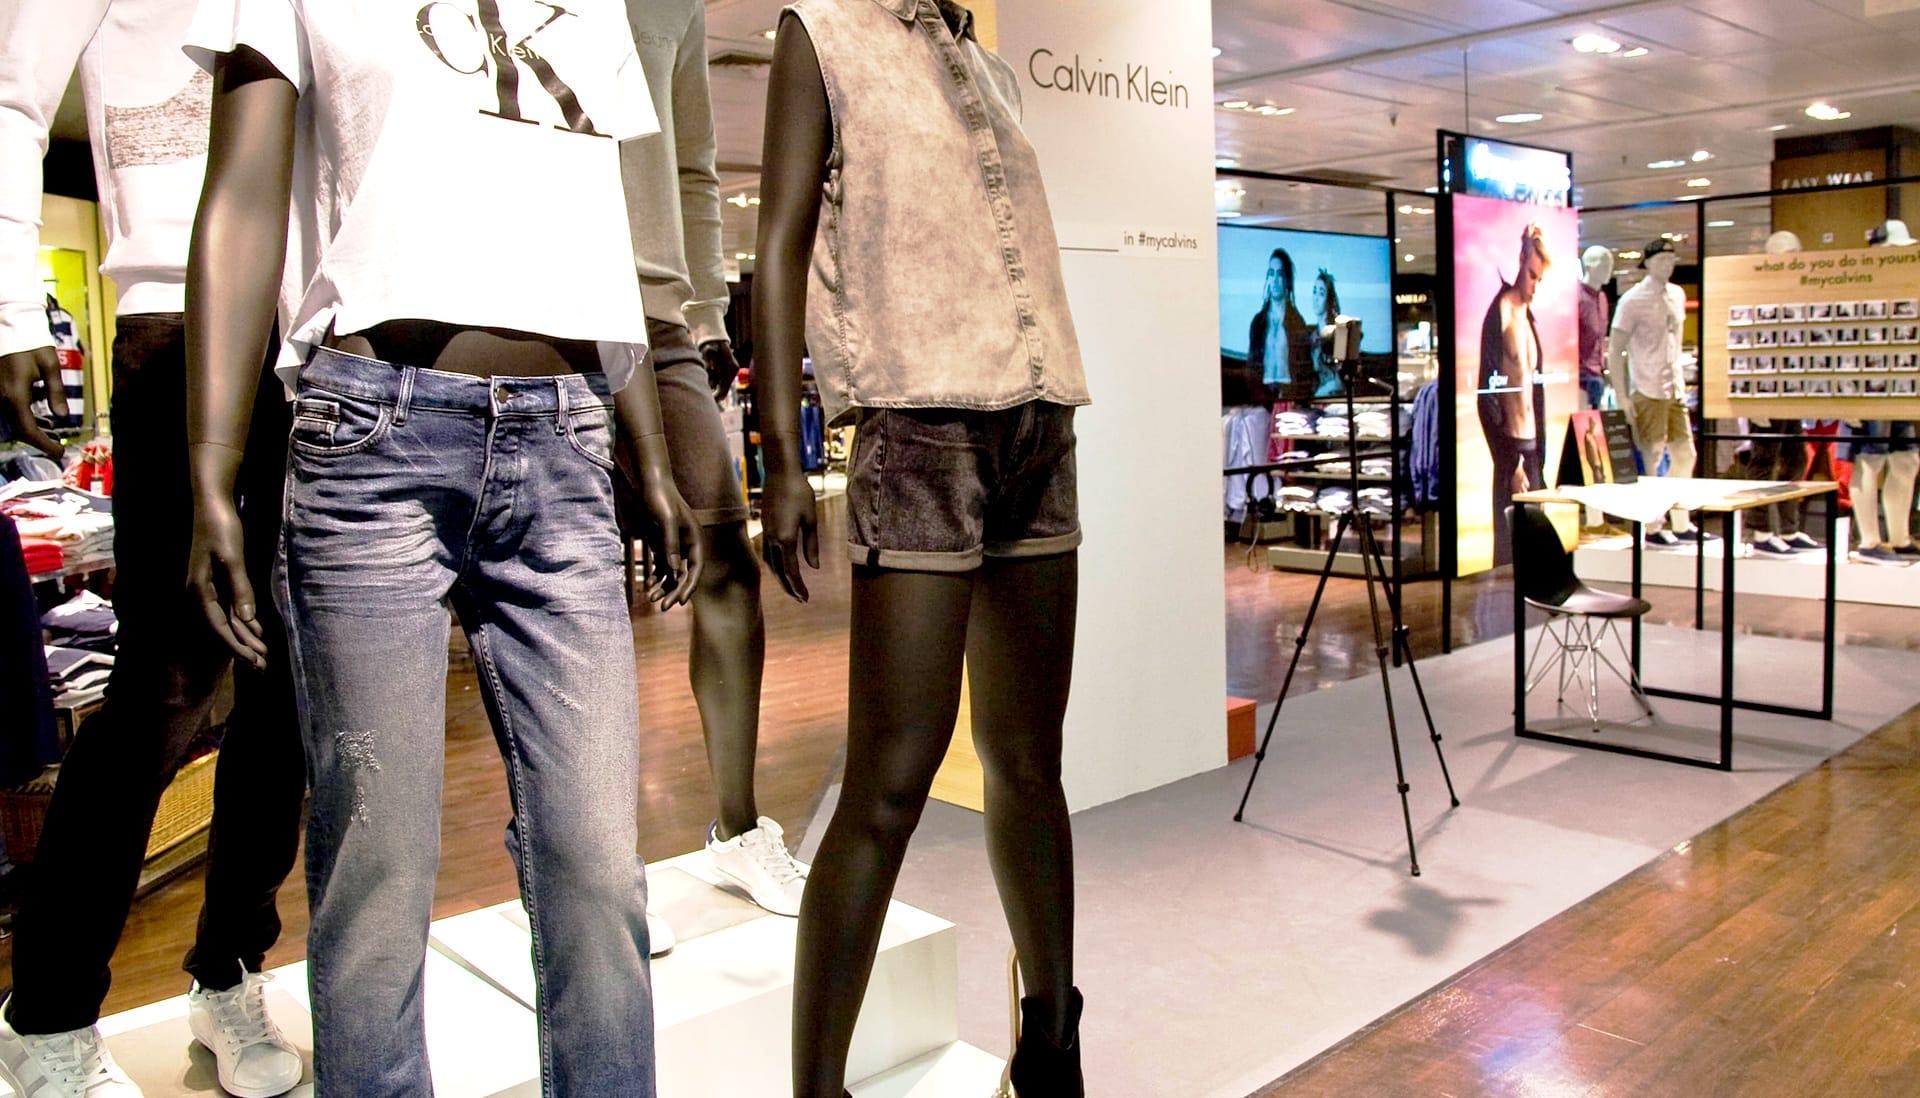 Corner promocional de Calvin Klein en un espacio comercial